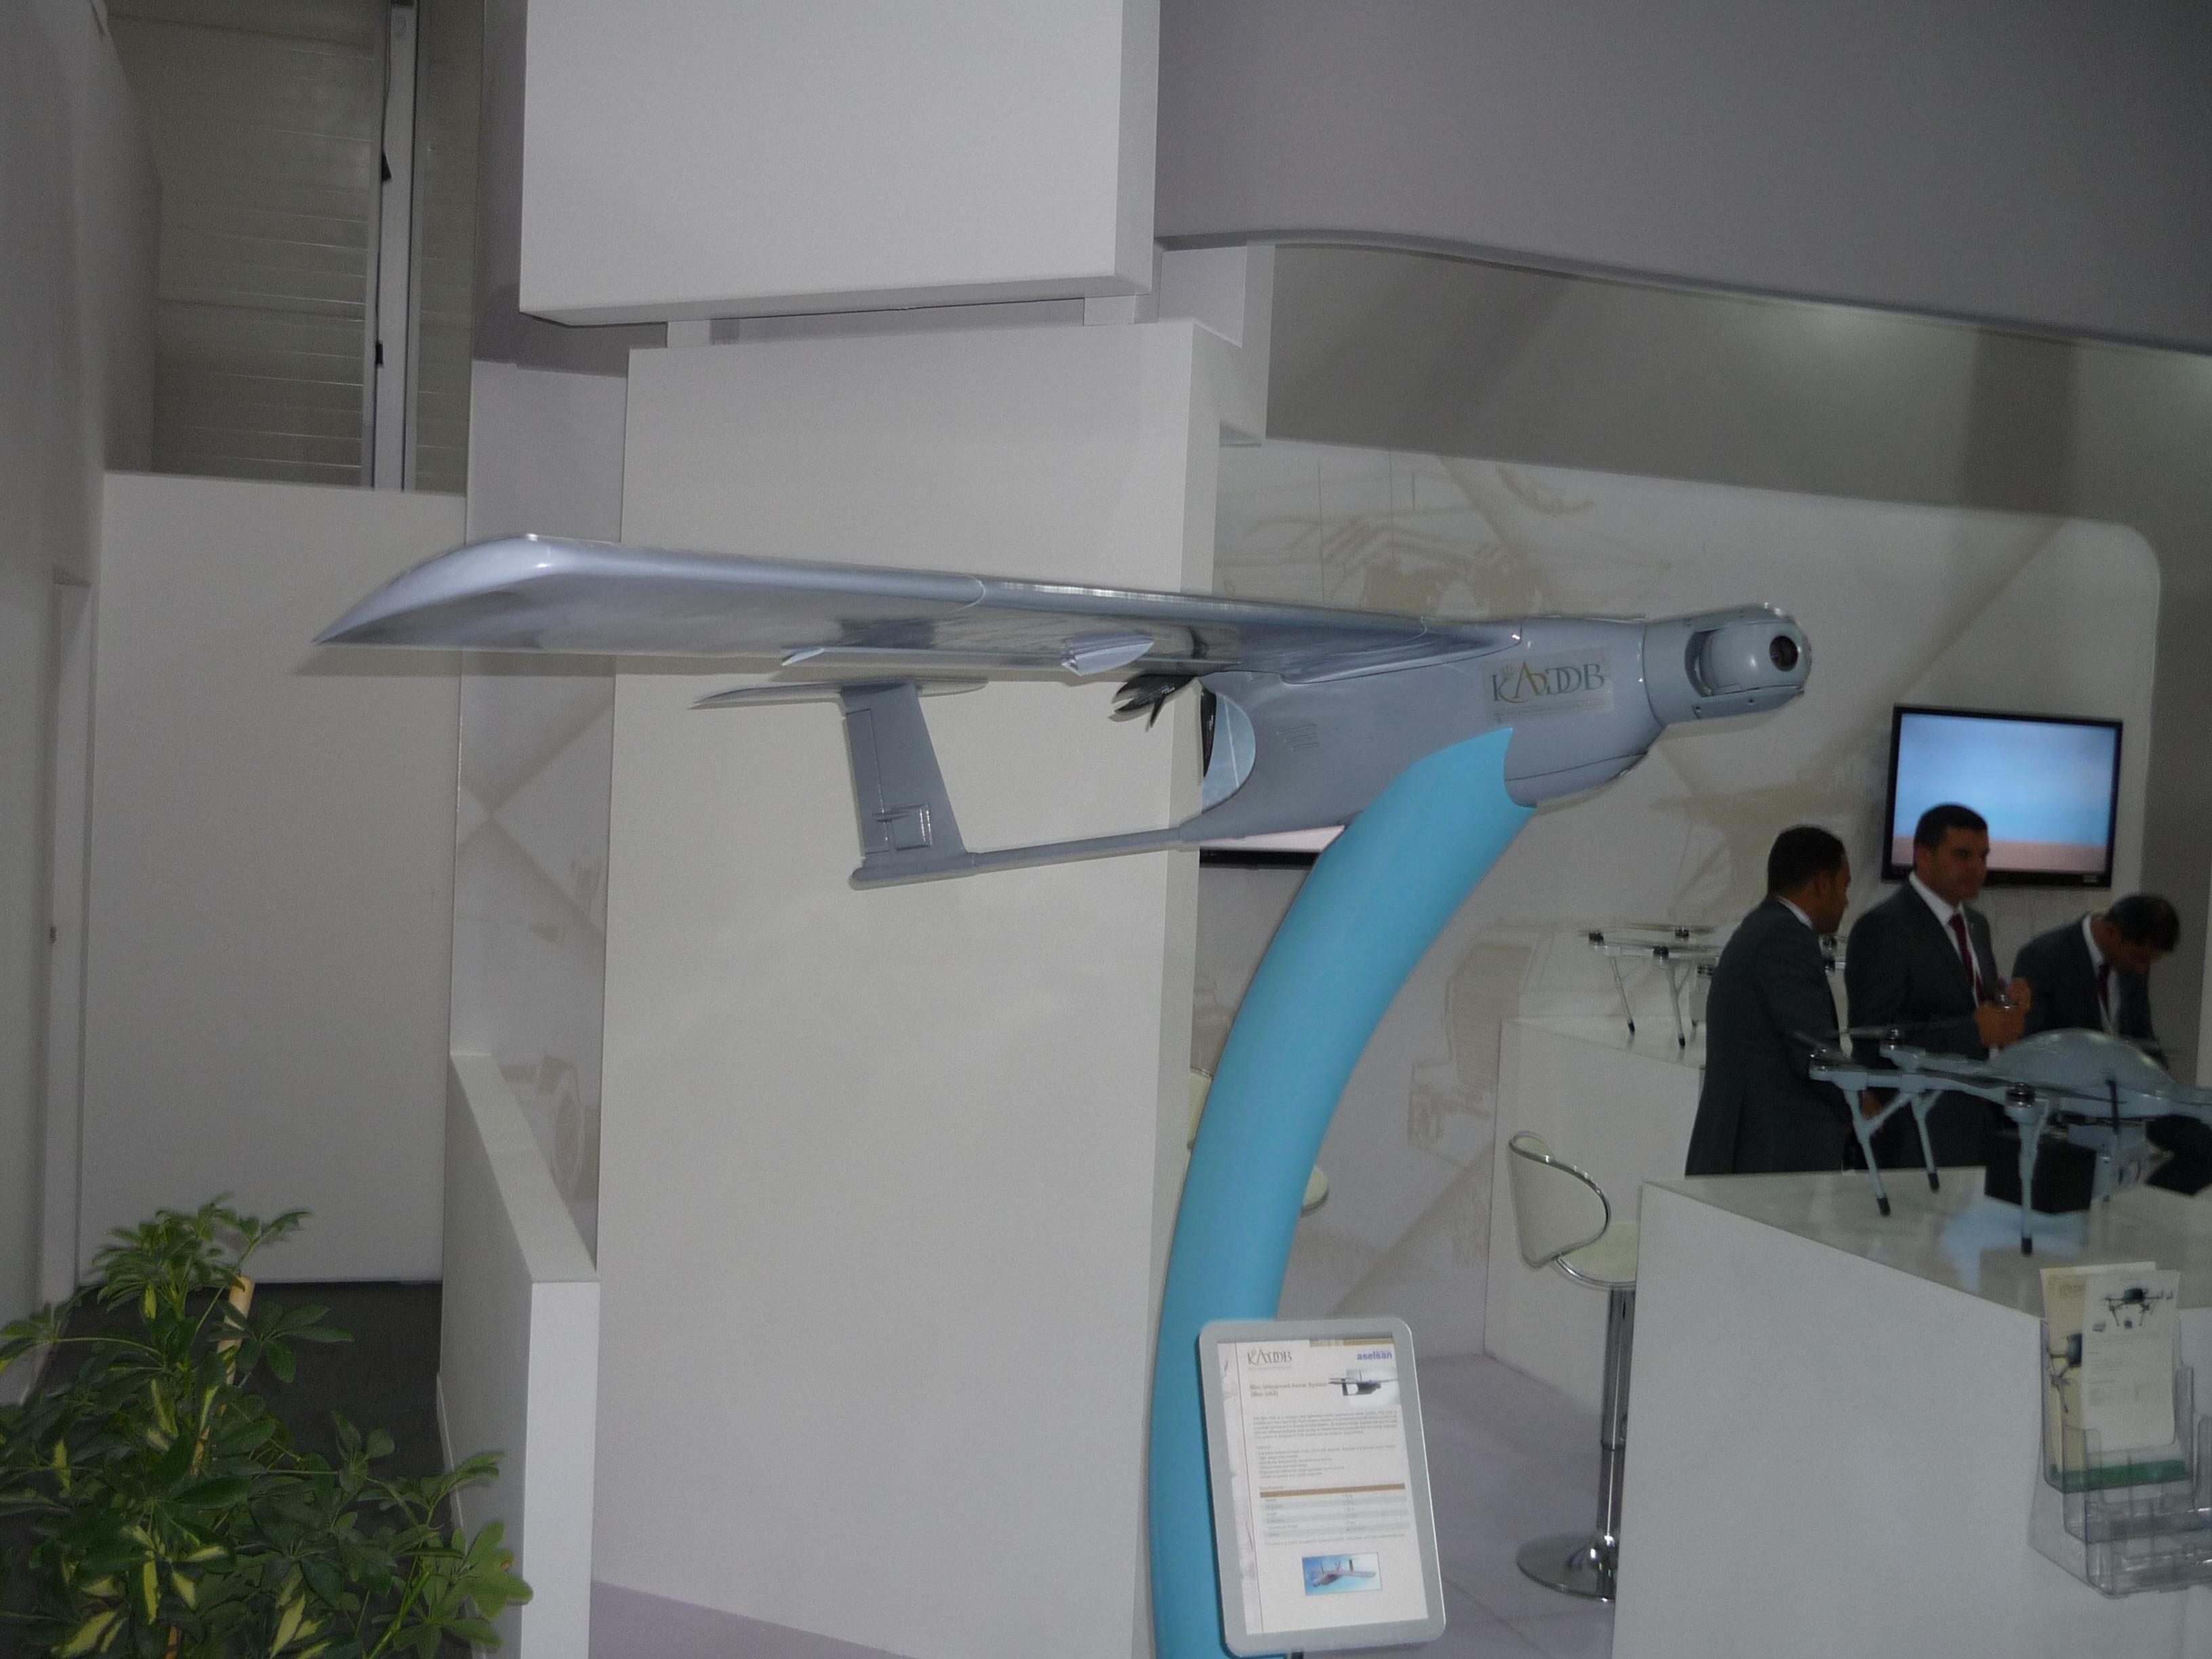 P1010572